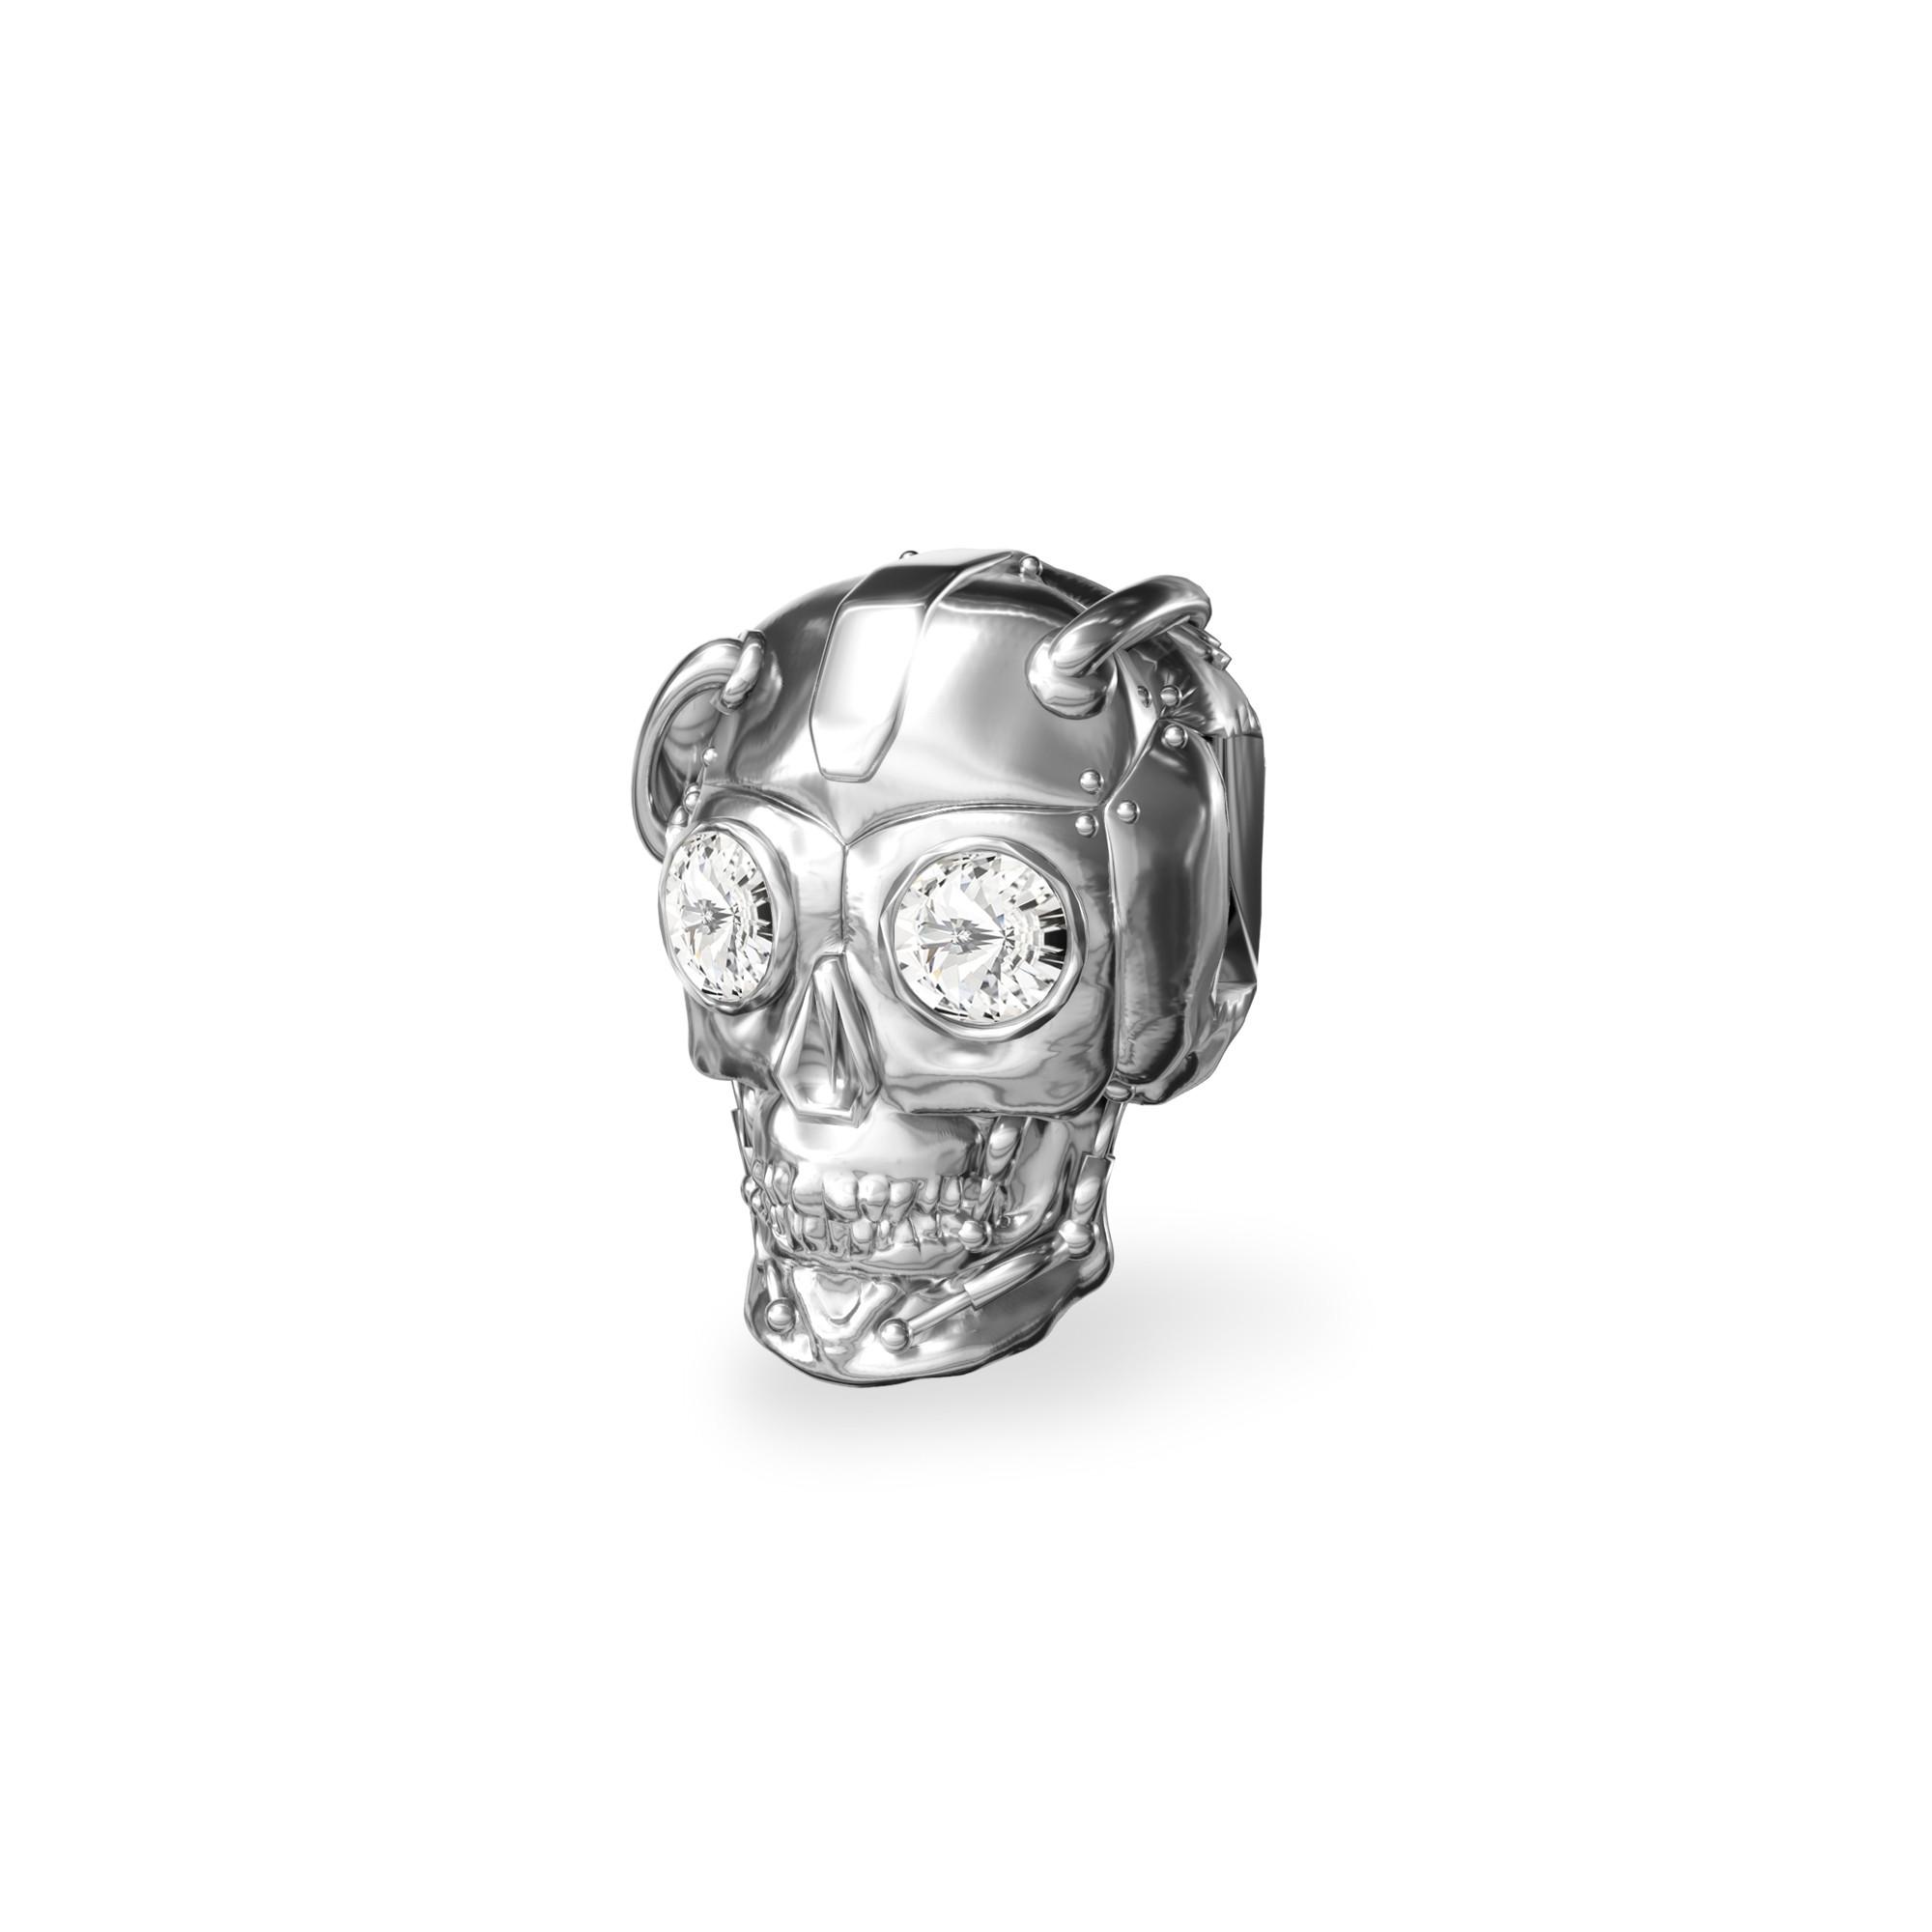 Abstandshalter roboter SCHÄDEL silber 925 Swarovski Crystals